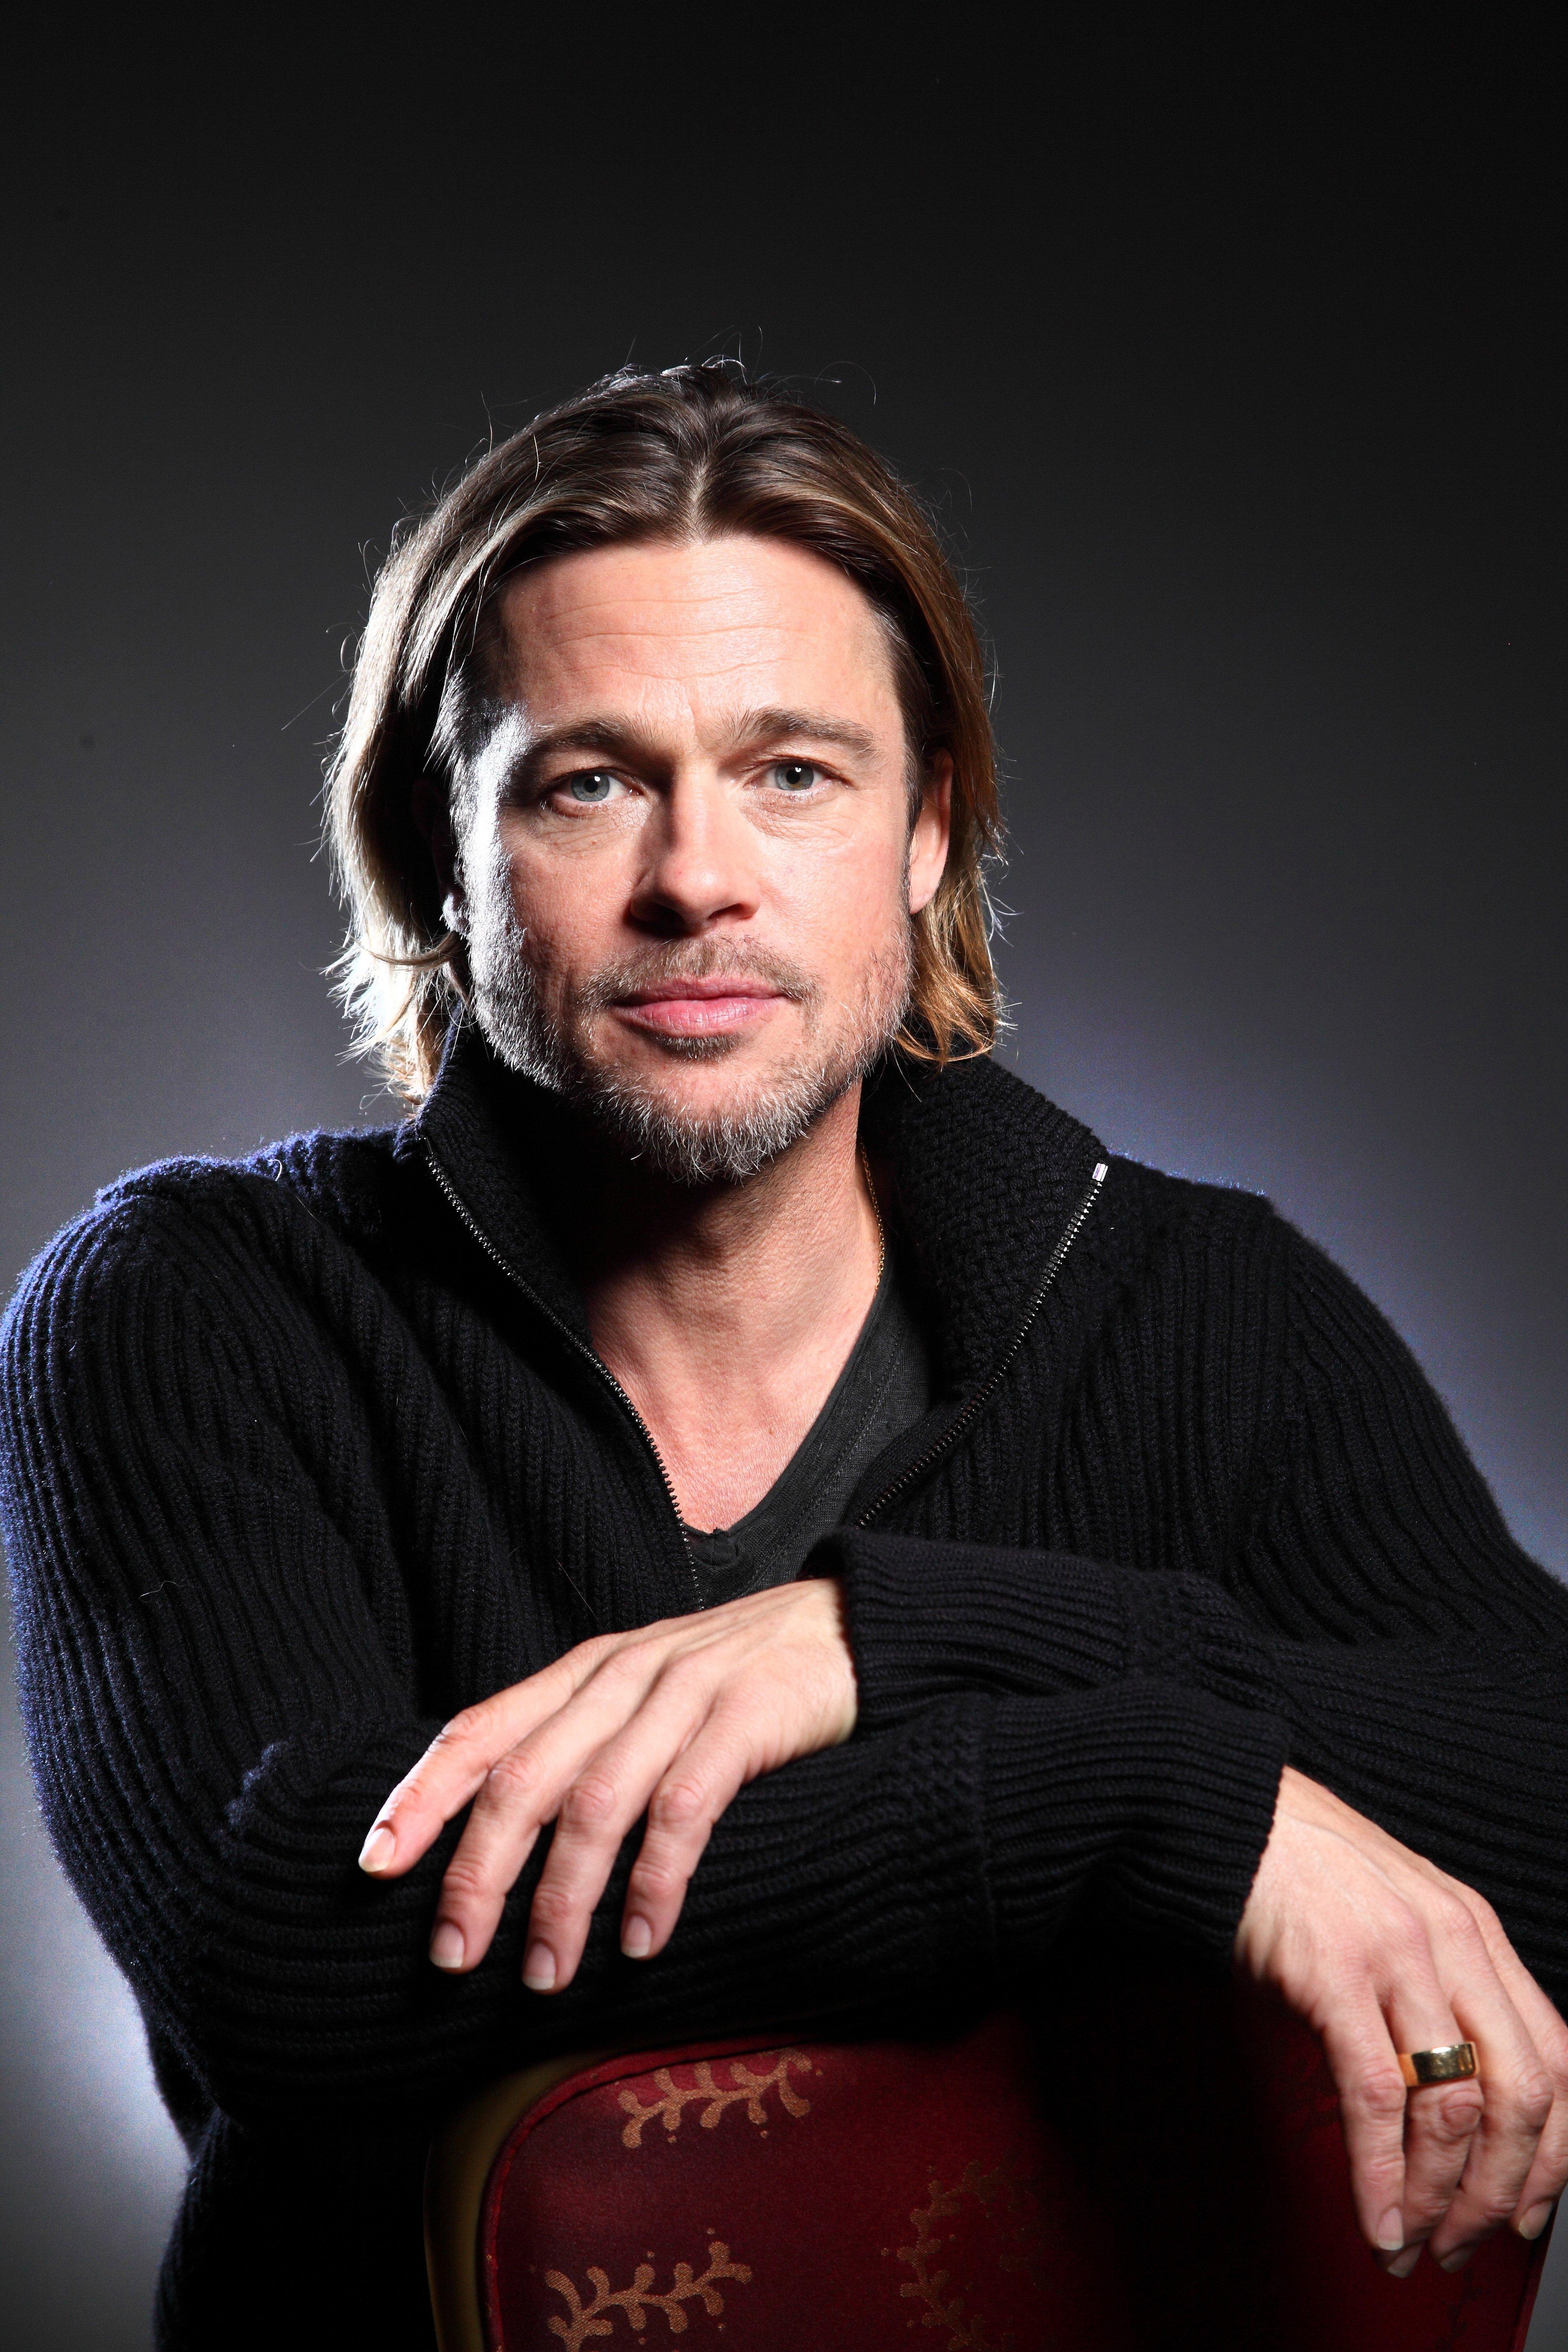 Brad Pitt Photo 880 Of 965 Pics Wallpaper Photo 646458